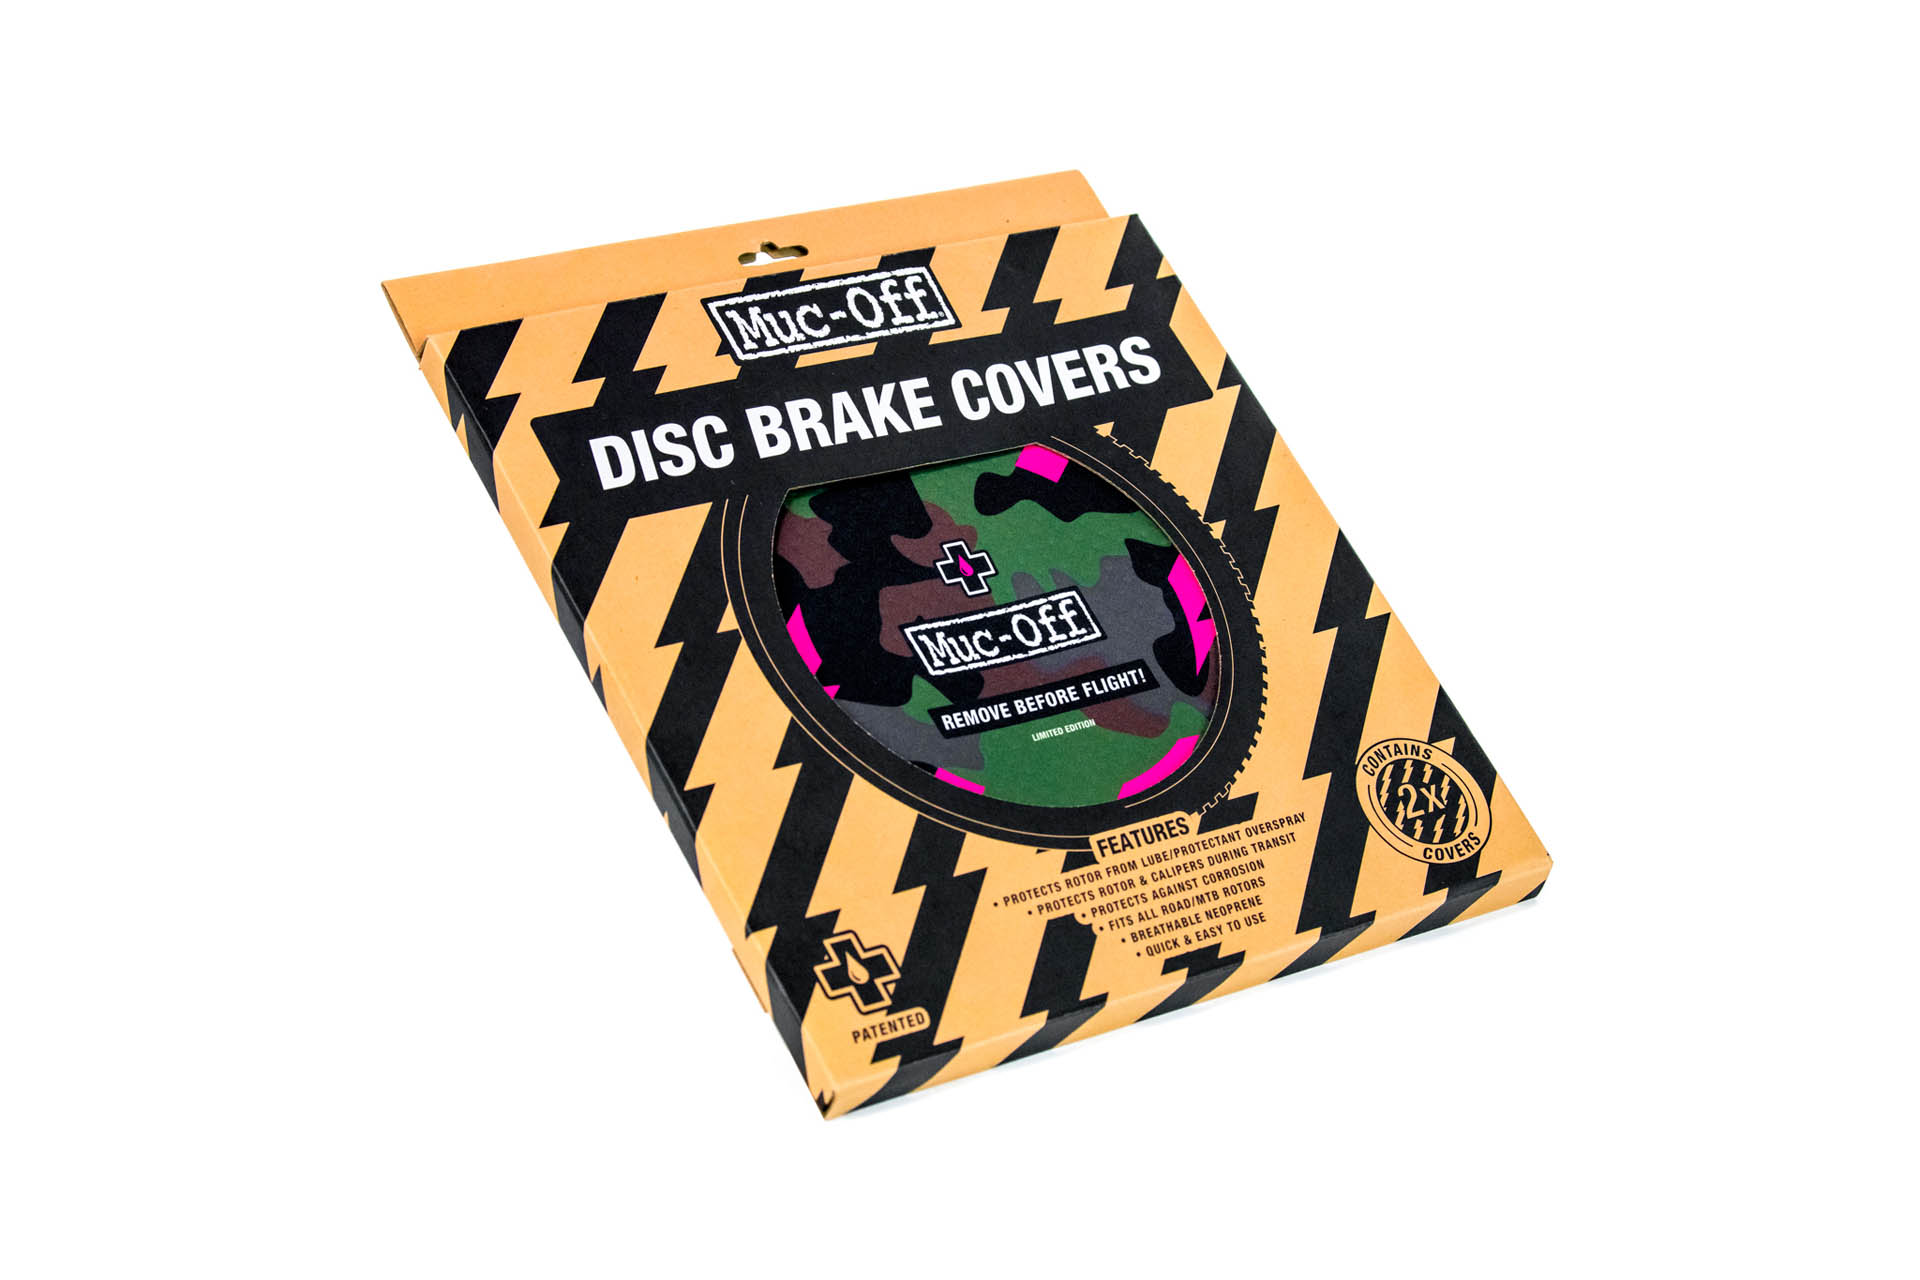 Disc-Brake-Covers-Camo-Picture-01